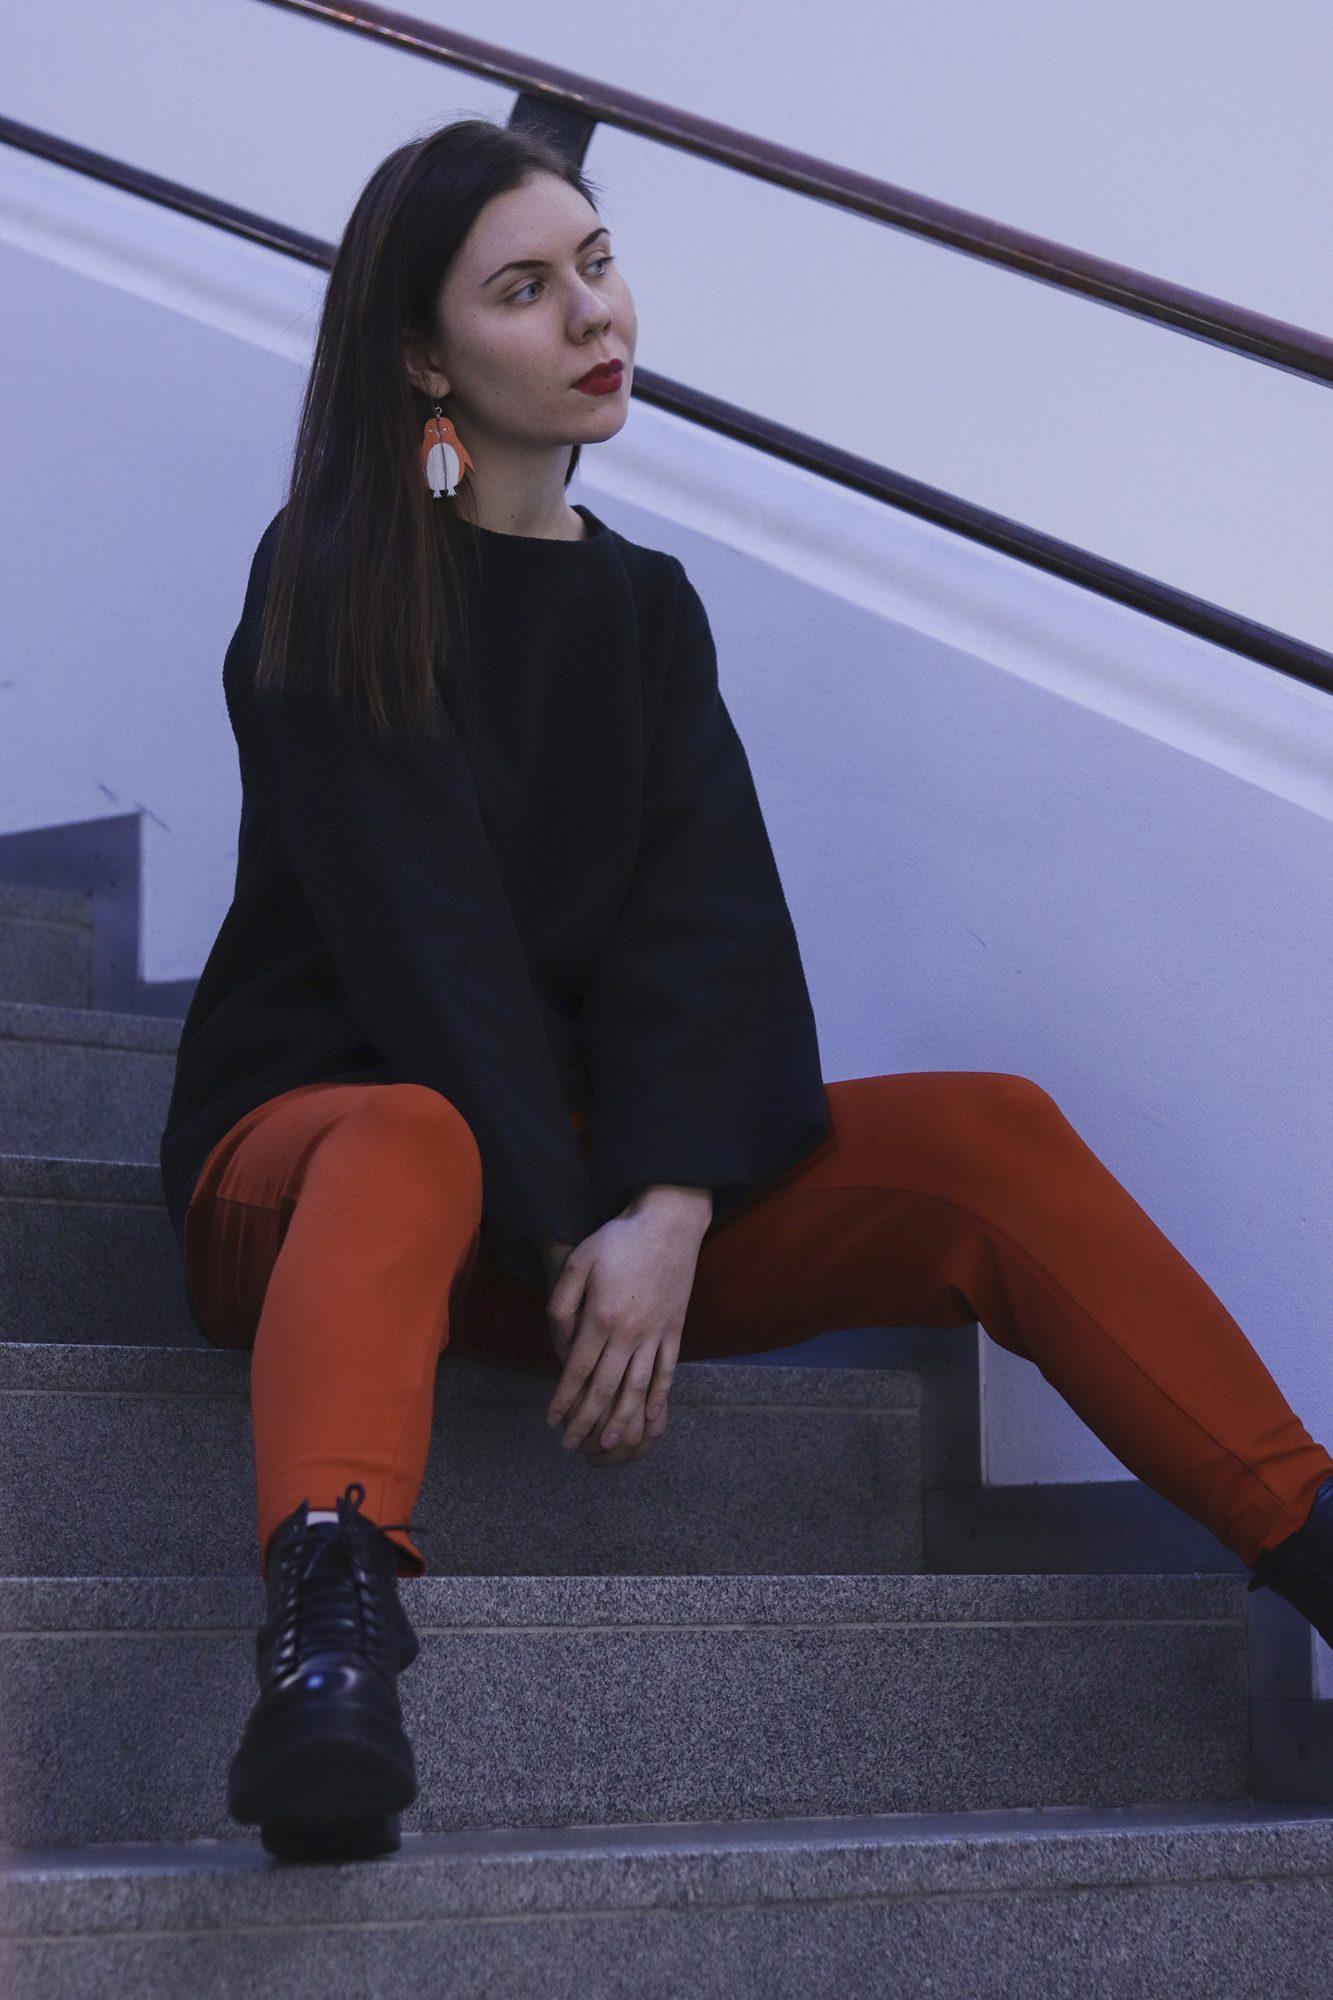 aarre_woman_little_stranger_struck_jenina_shirt_carol_pants_bossa_nova (6)_small